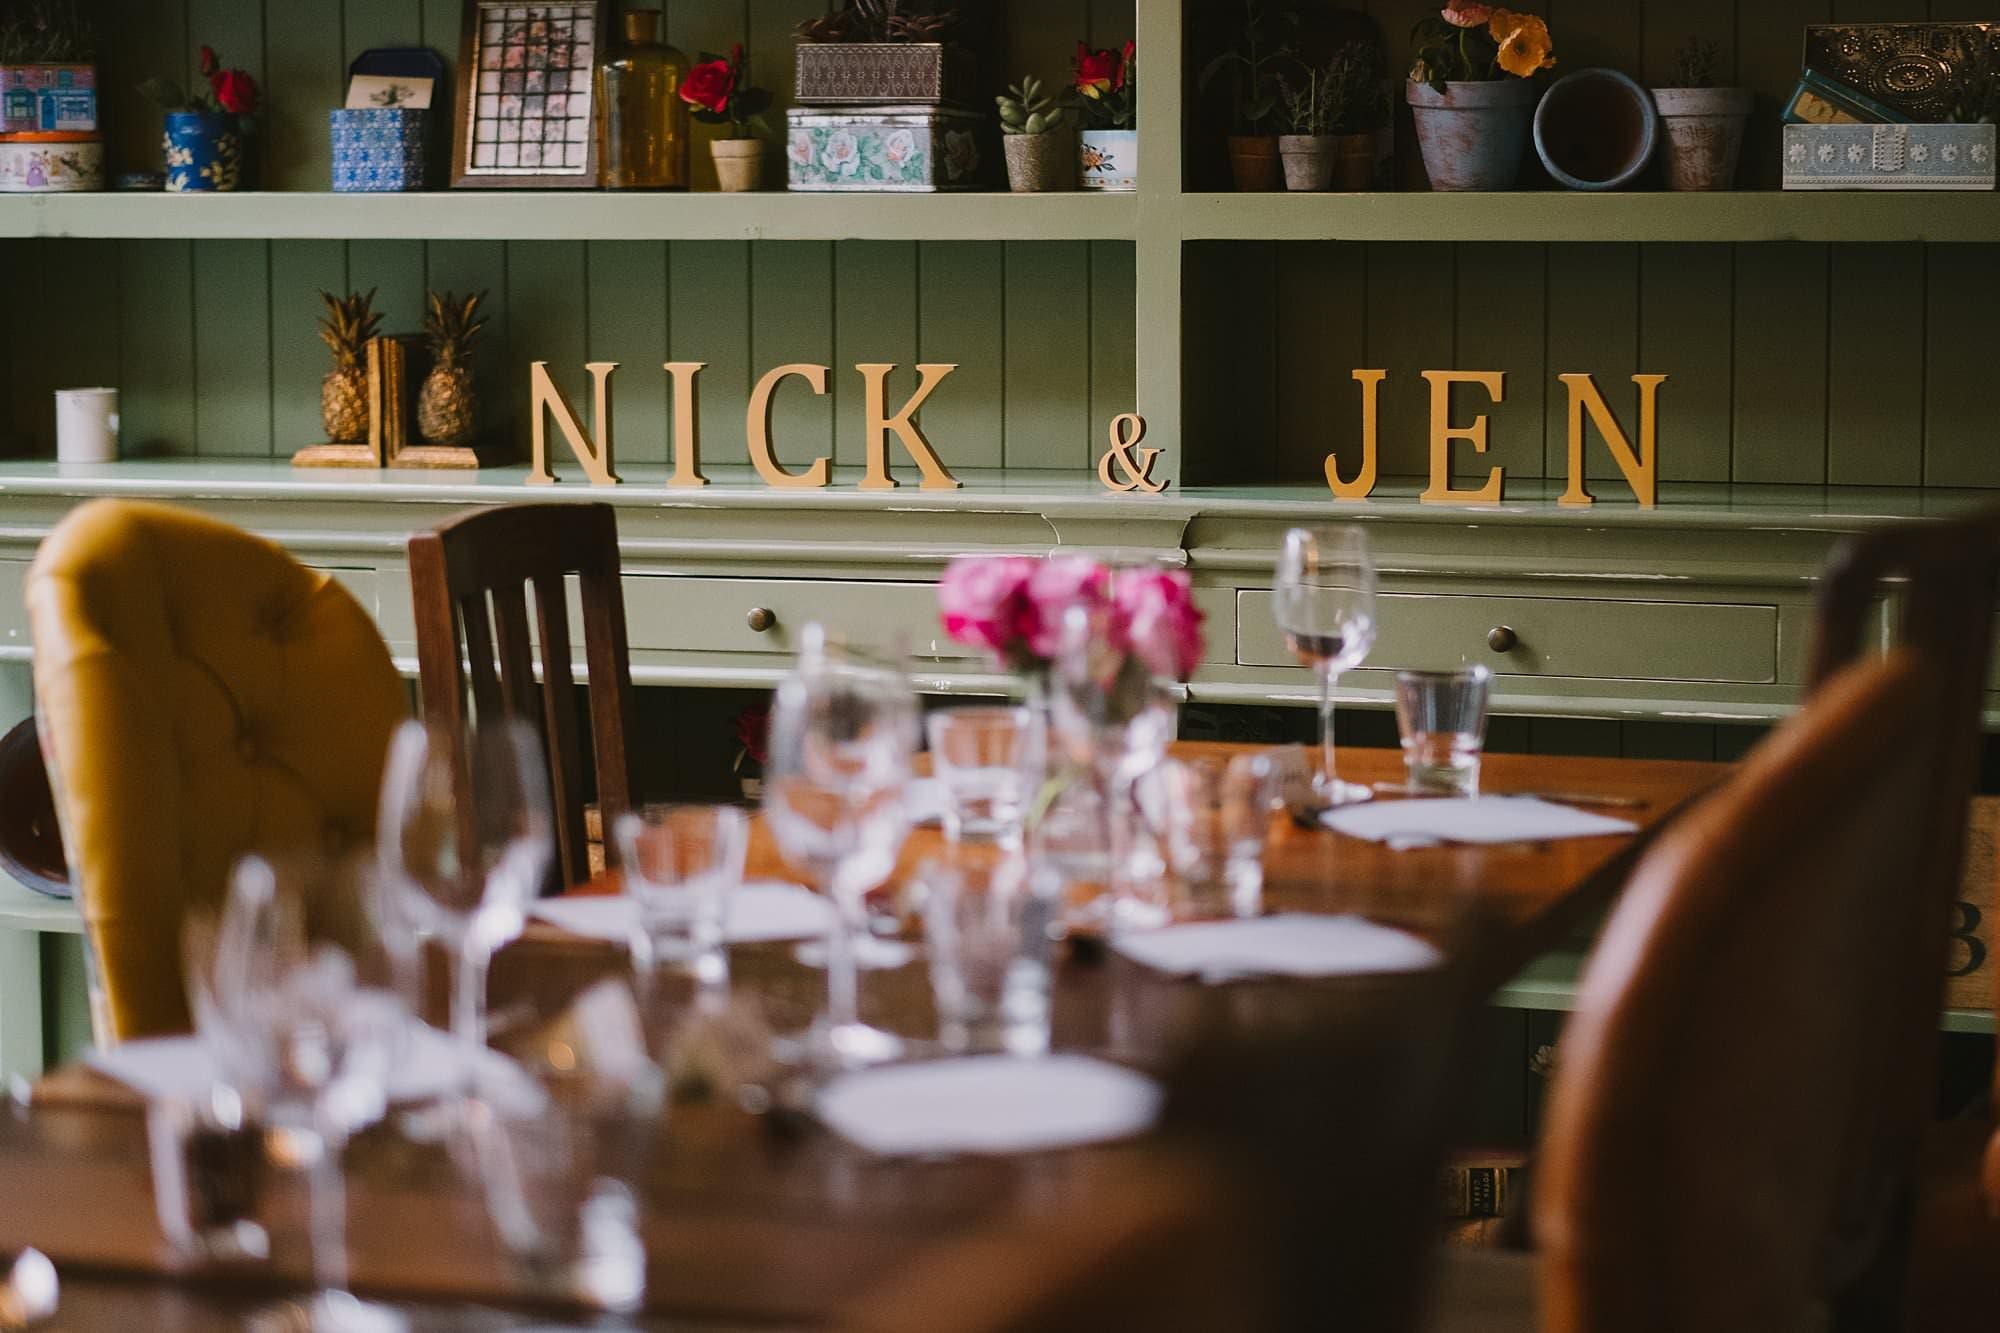 london pub wedding photographer jn 002 - The County Arms Wedding Photographer   Jen & Nick